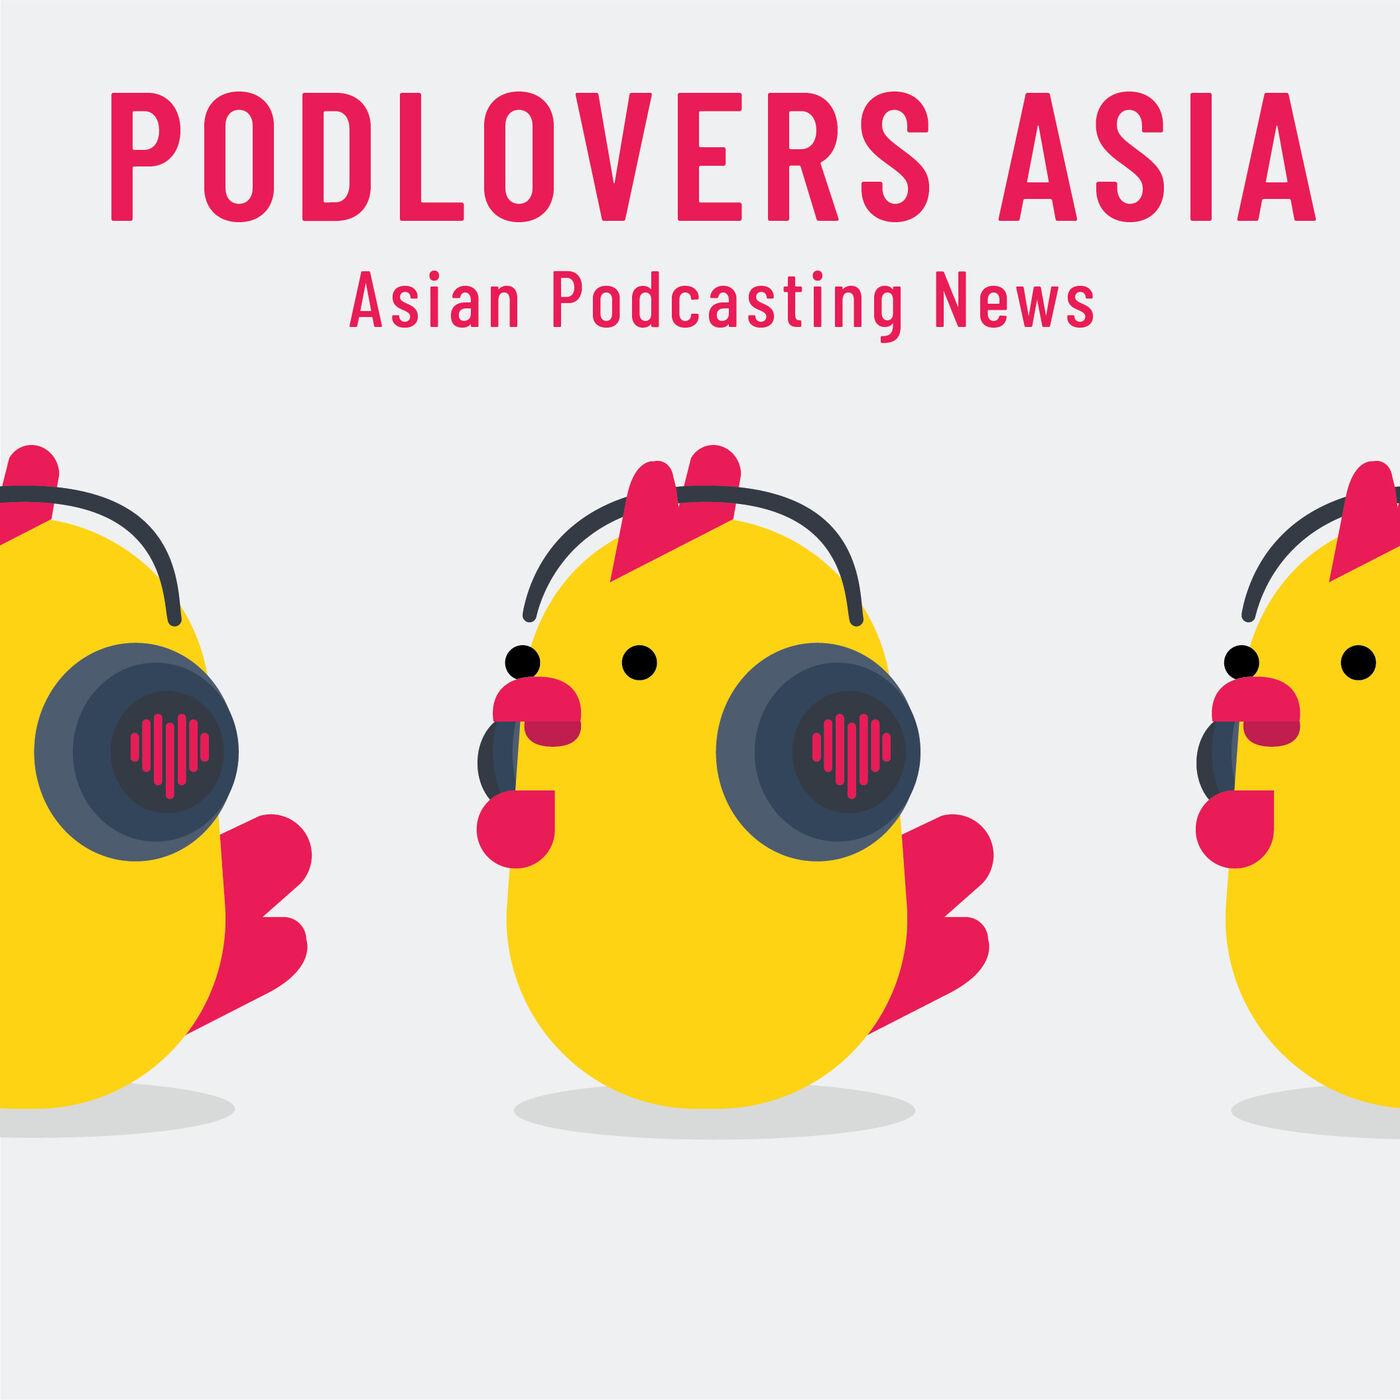 BONUS: Podlovers Asia Group Beta is launching!